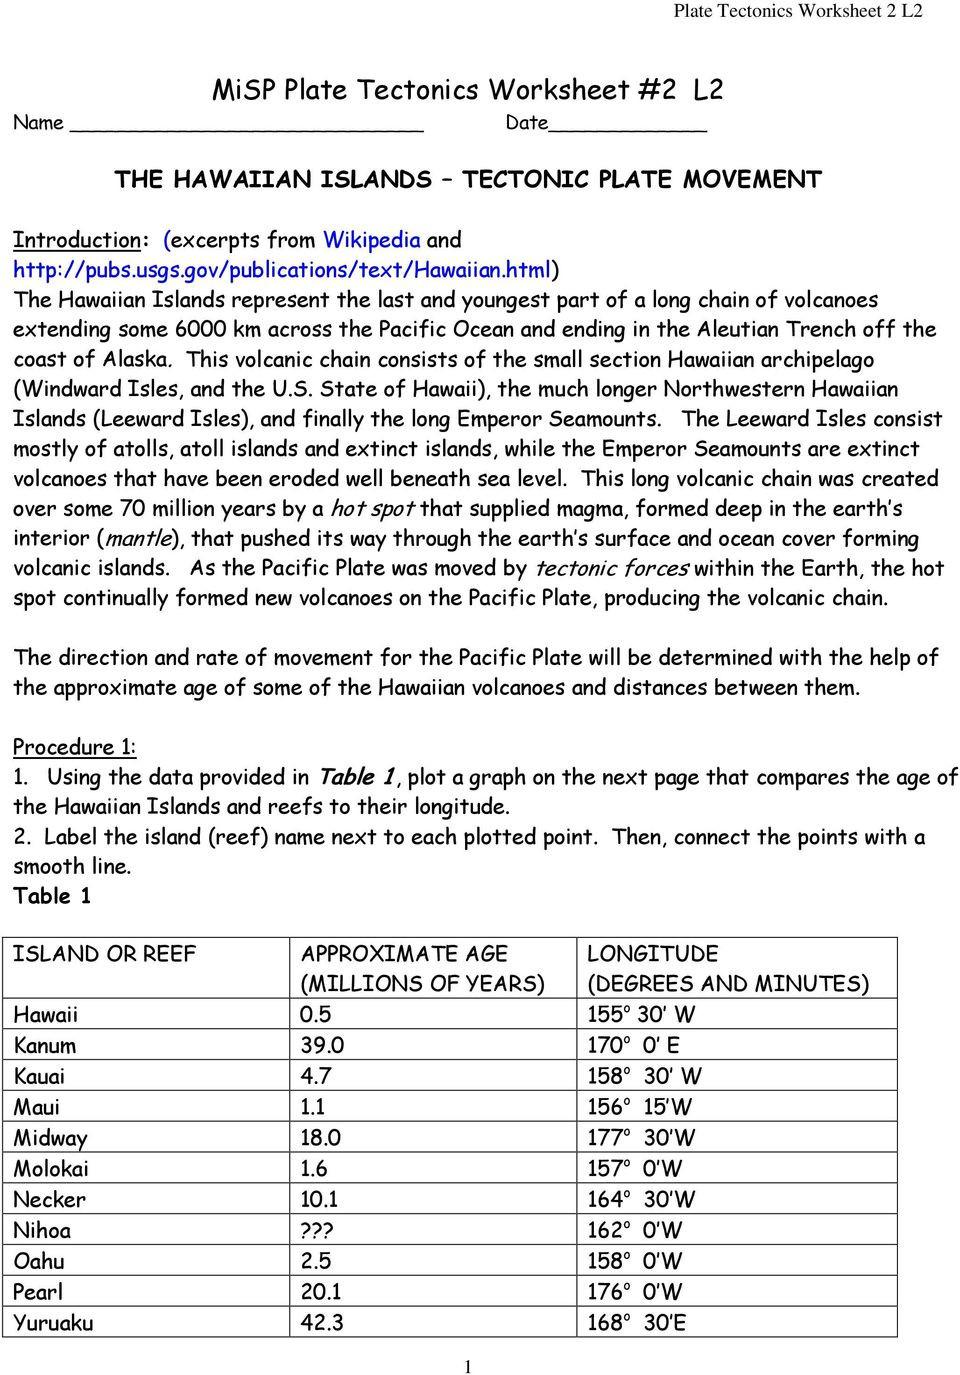 Plate Tectonic Worksheet Answers Misp Plate Tectonics Worksheet 2 L2 Pdf Free Download